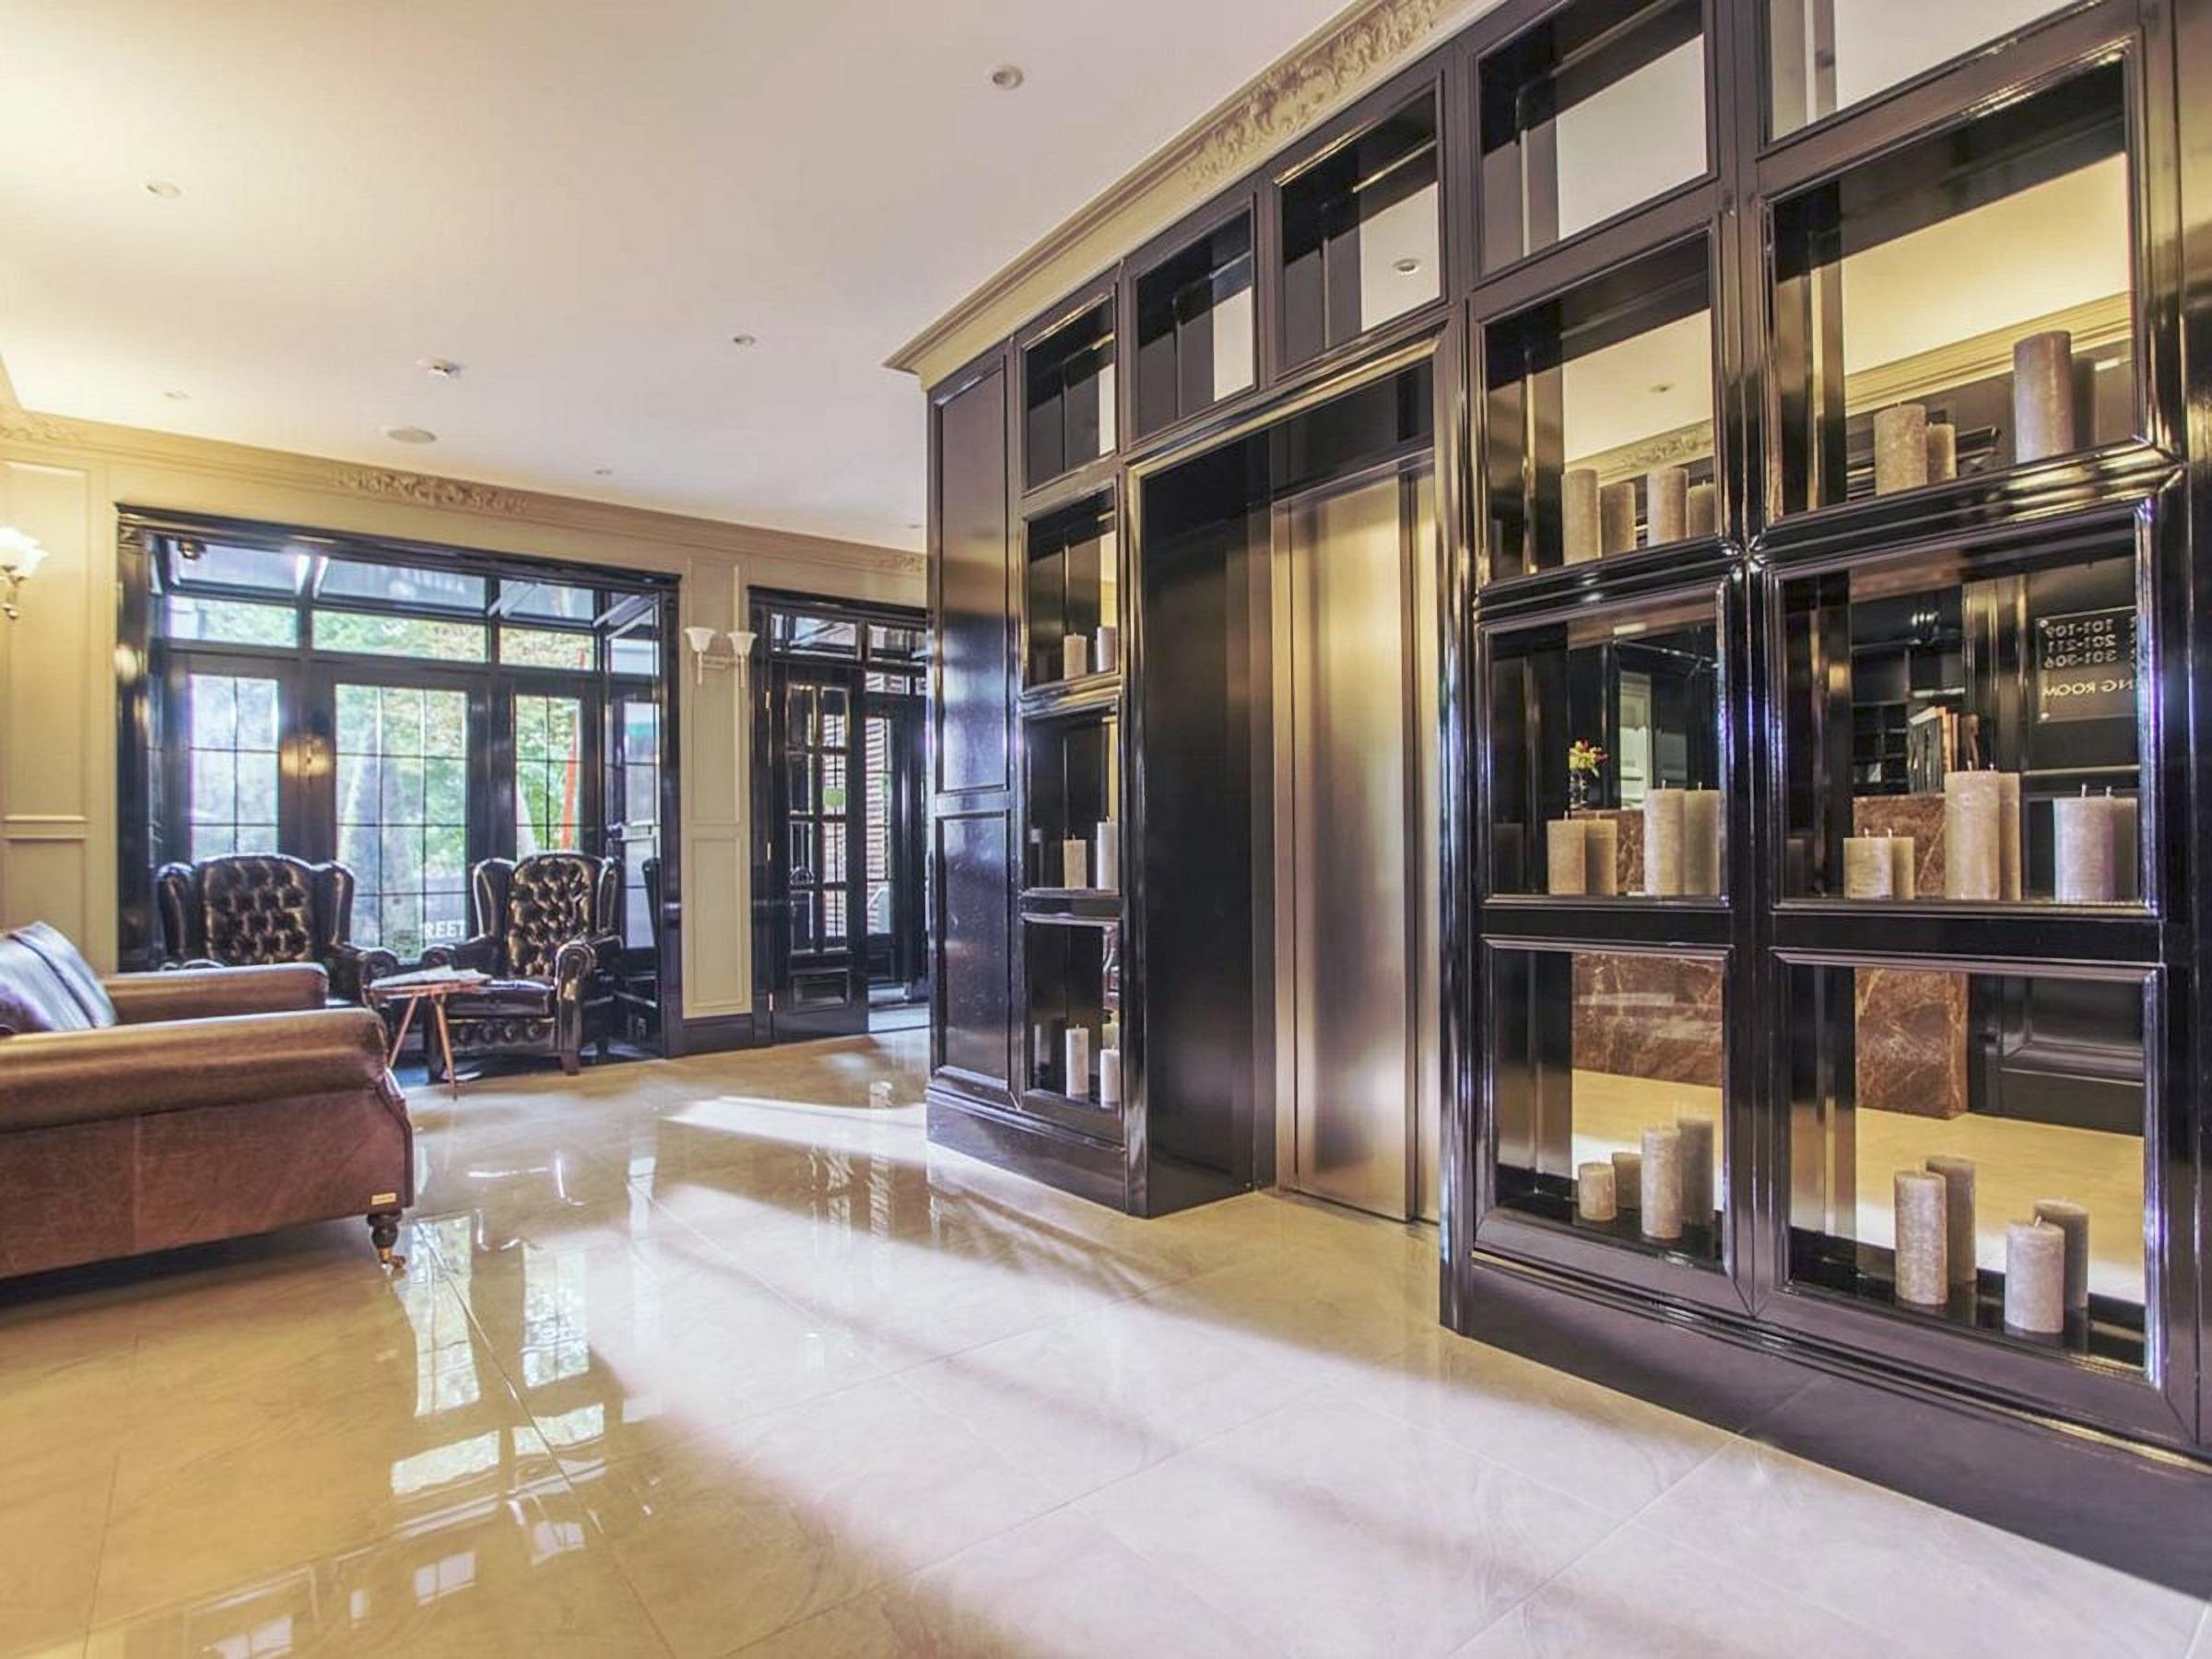 Wall Street Hotel Hall Odessa Ukraine